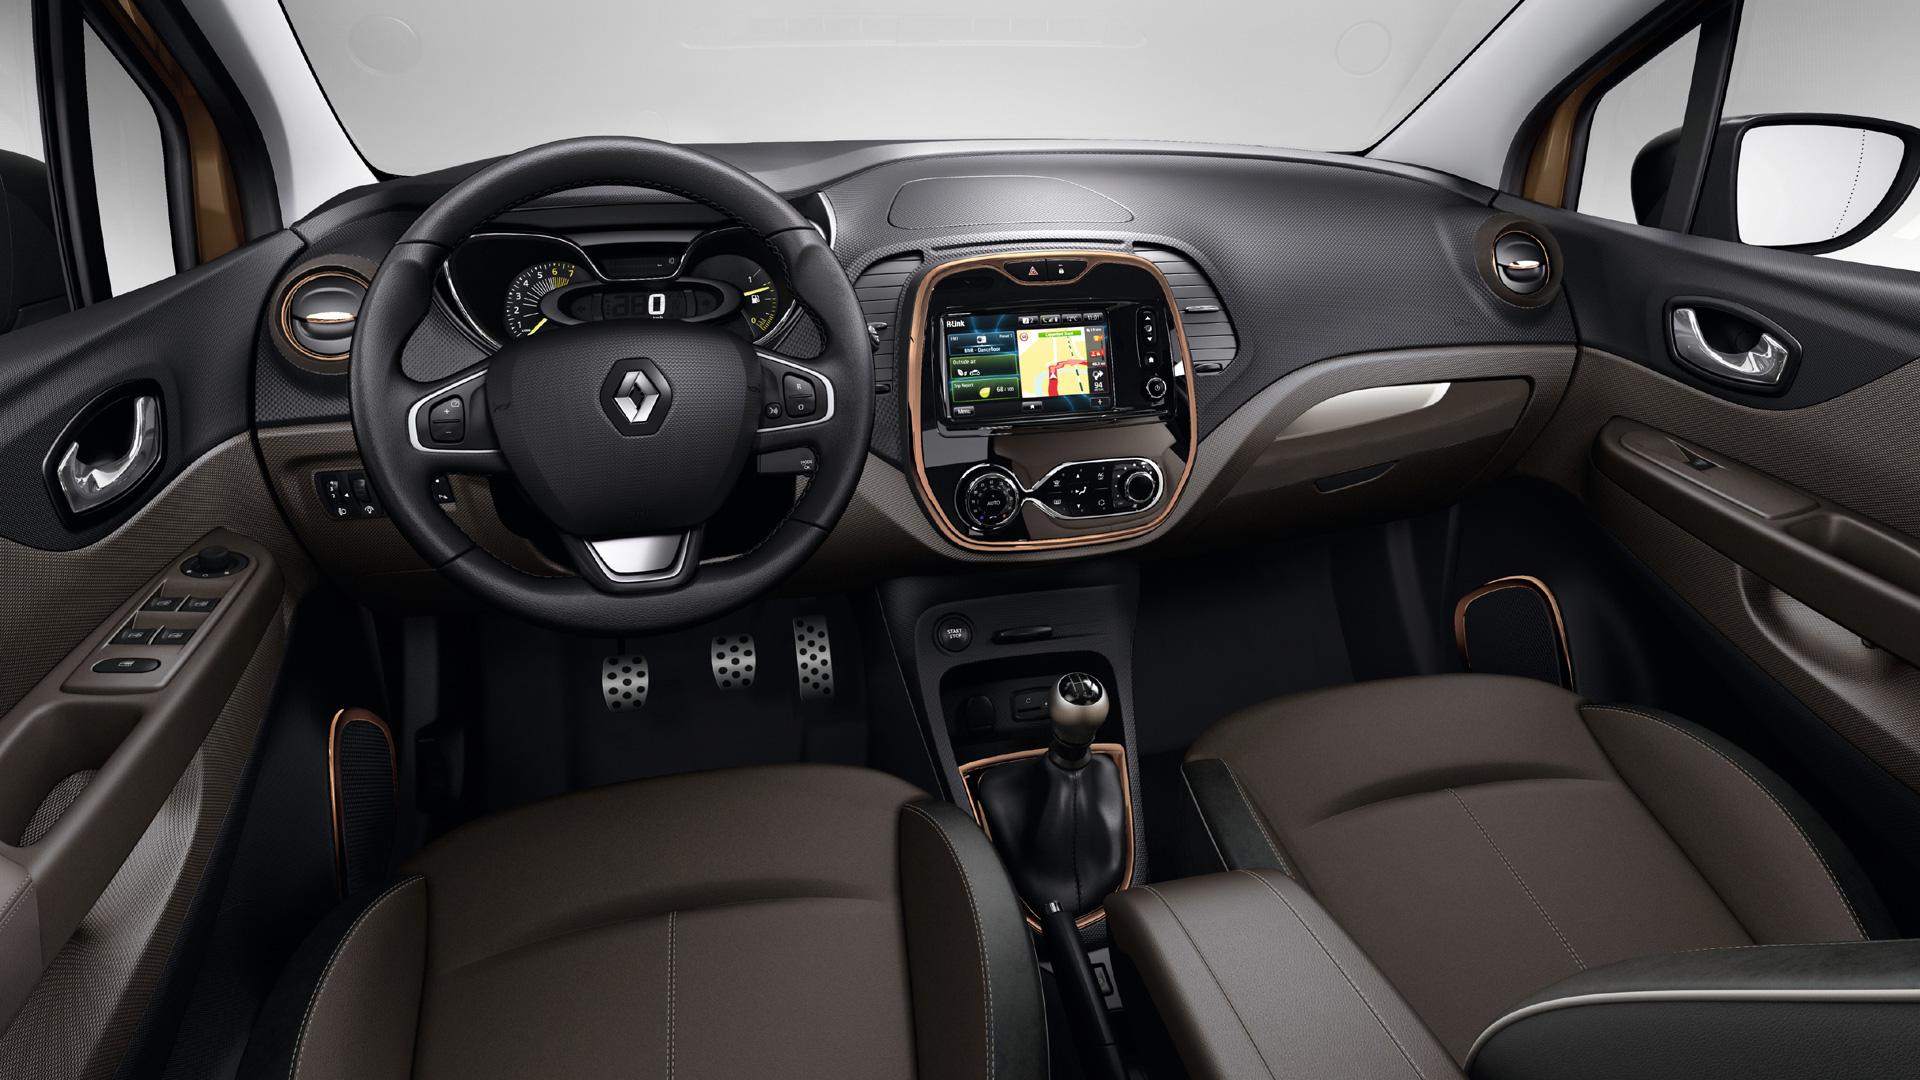 Renault captur sl premium llega el alto de gama - Interieur renault captur ...